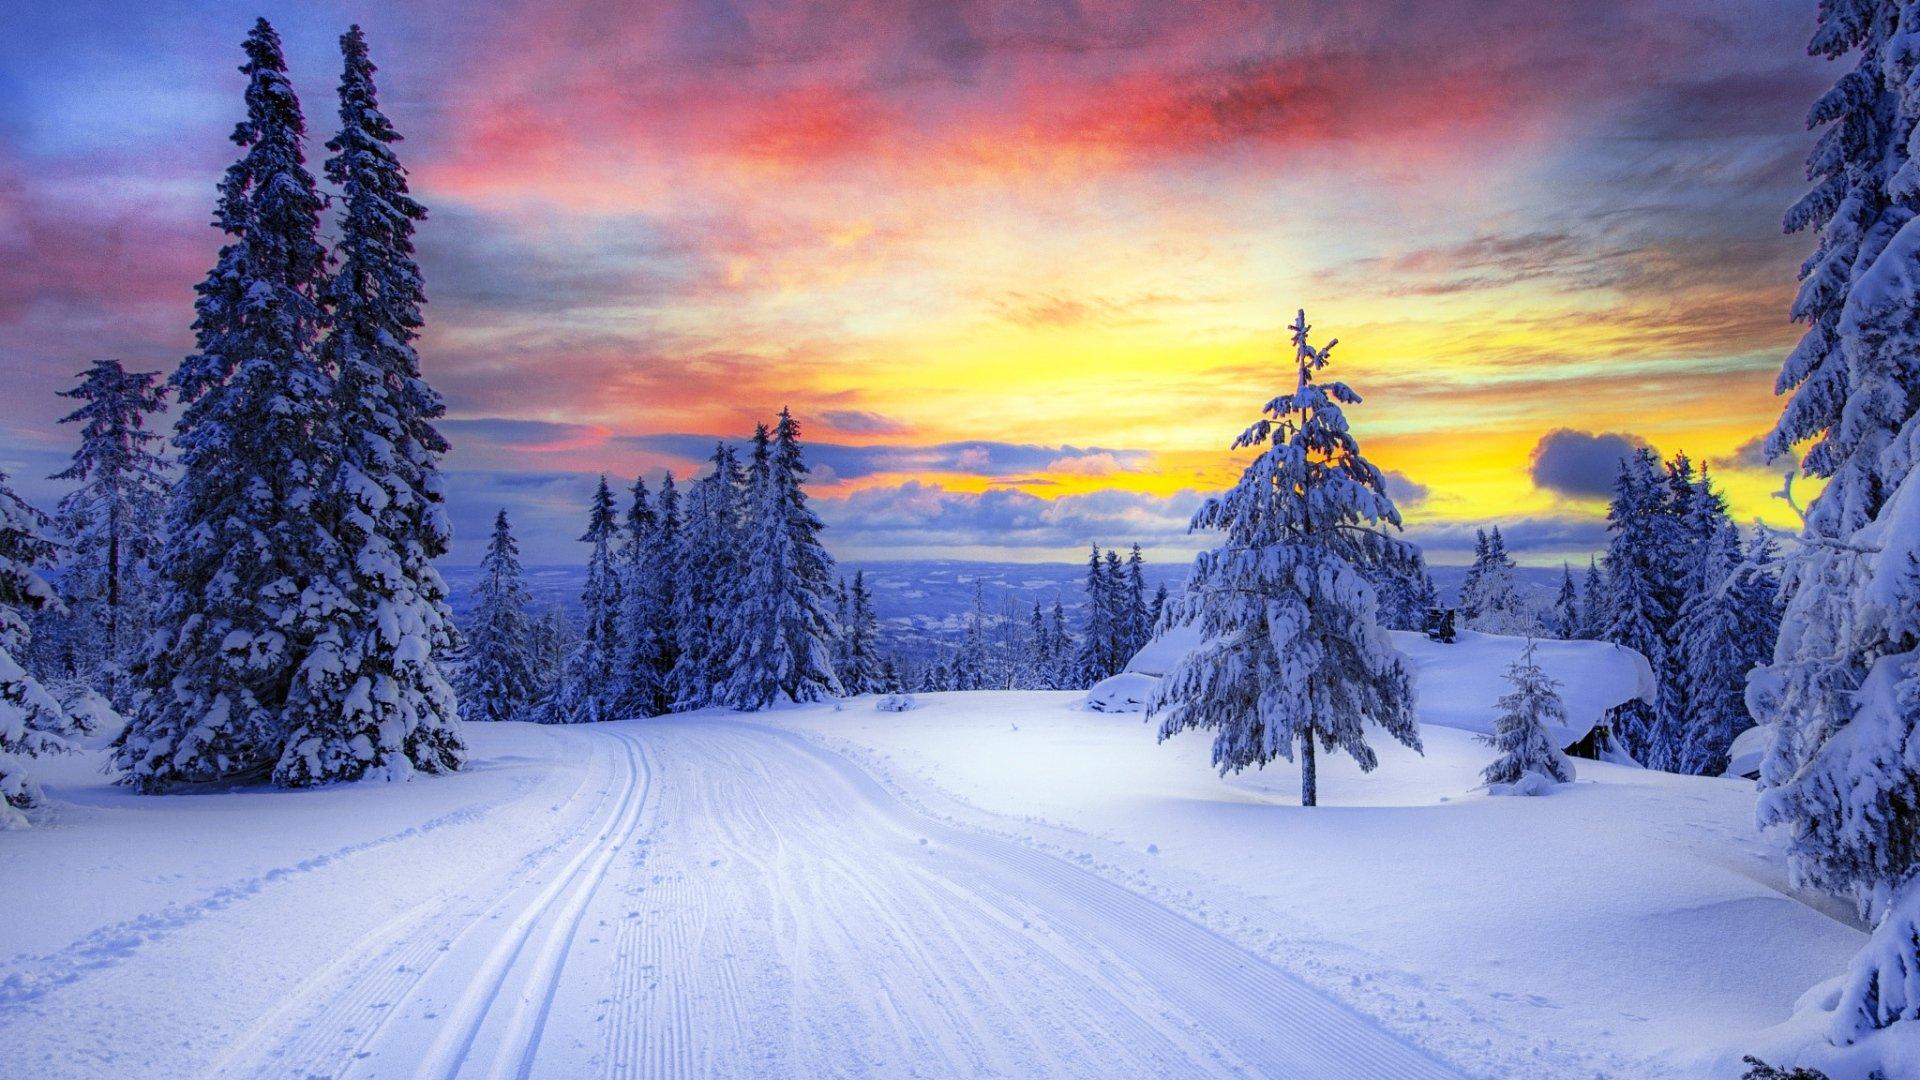 Заставка на аву зима картинка